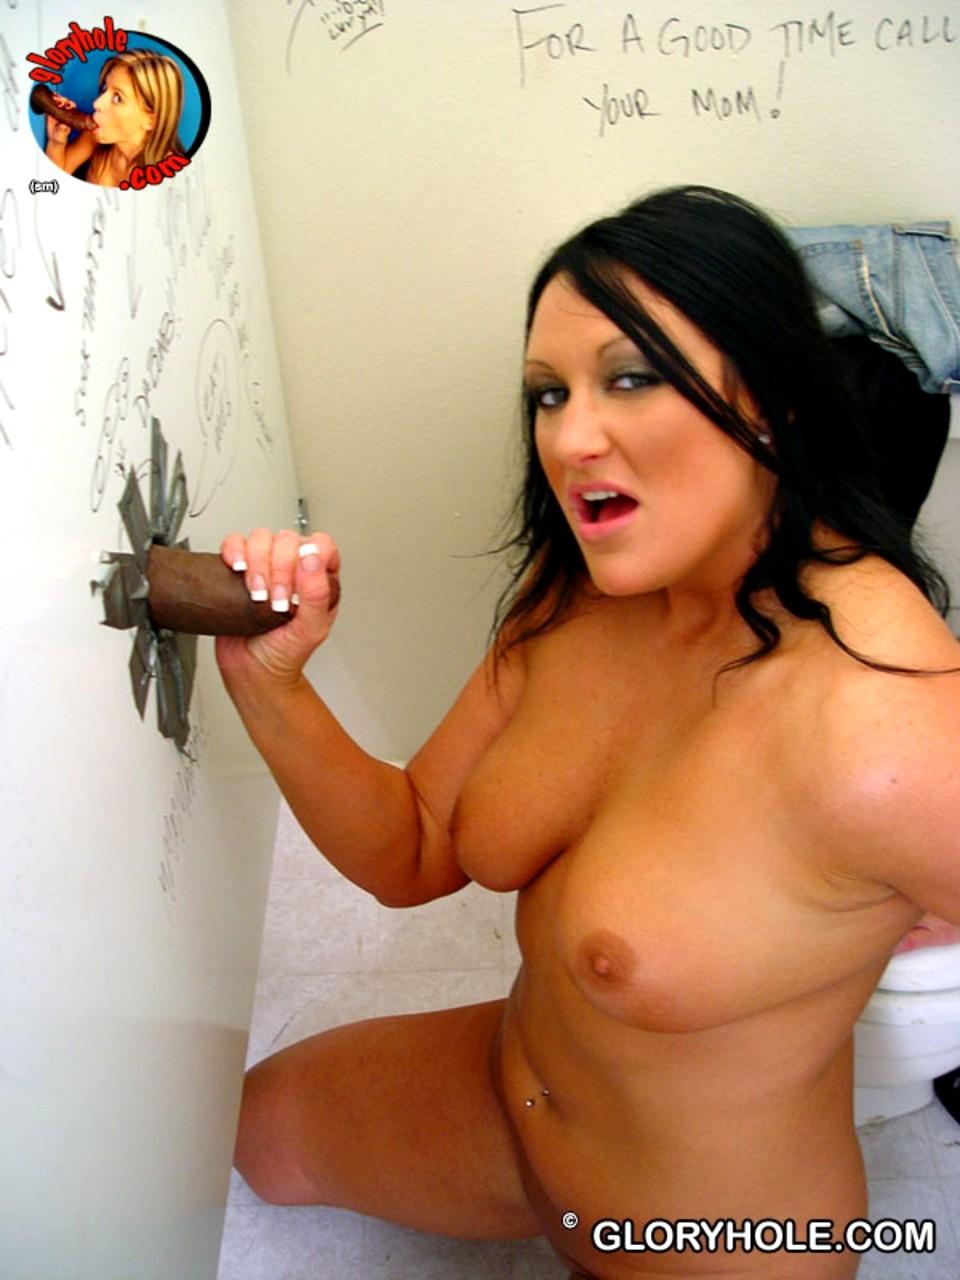 girl-extreme-glory-hole-big-titties-sex